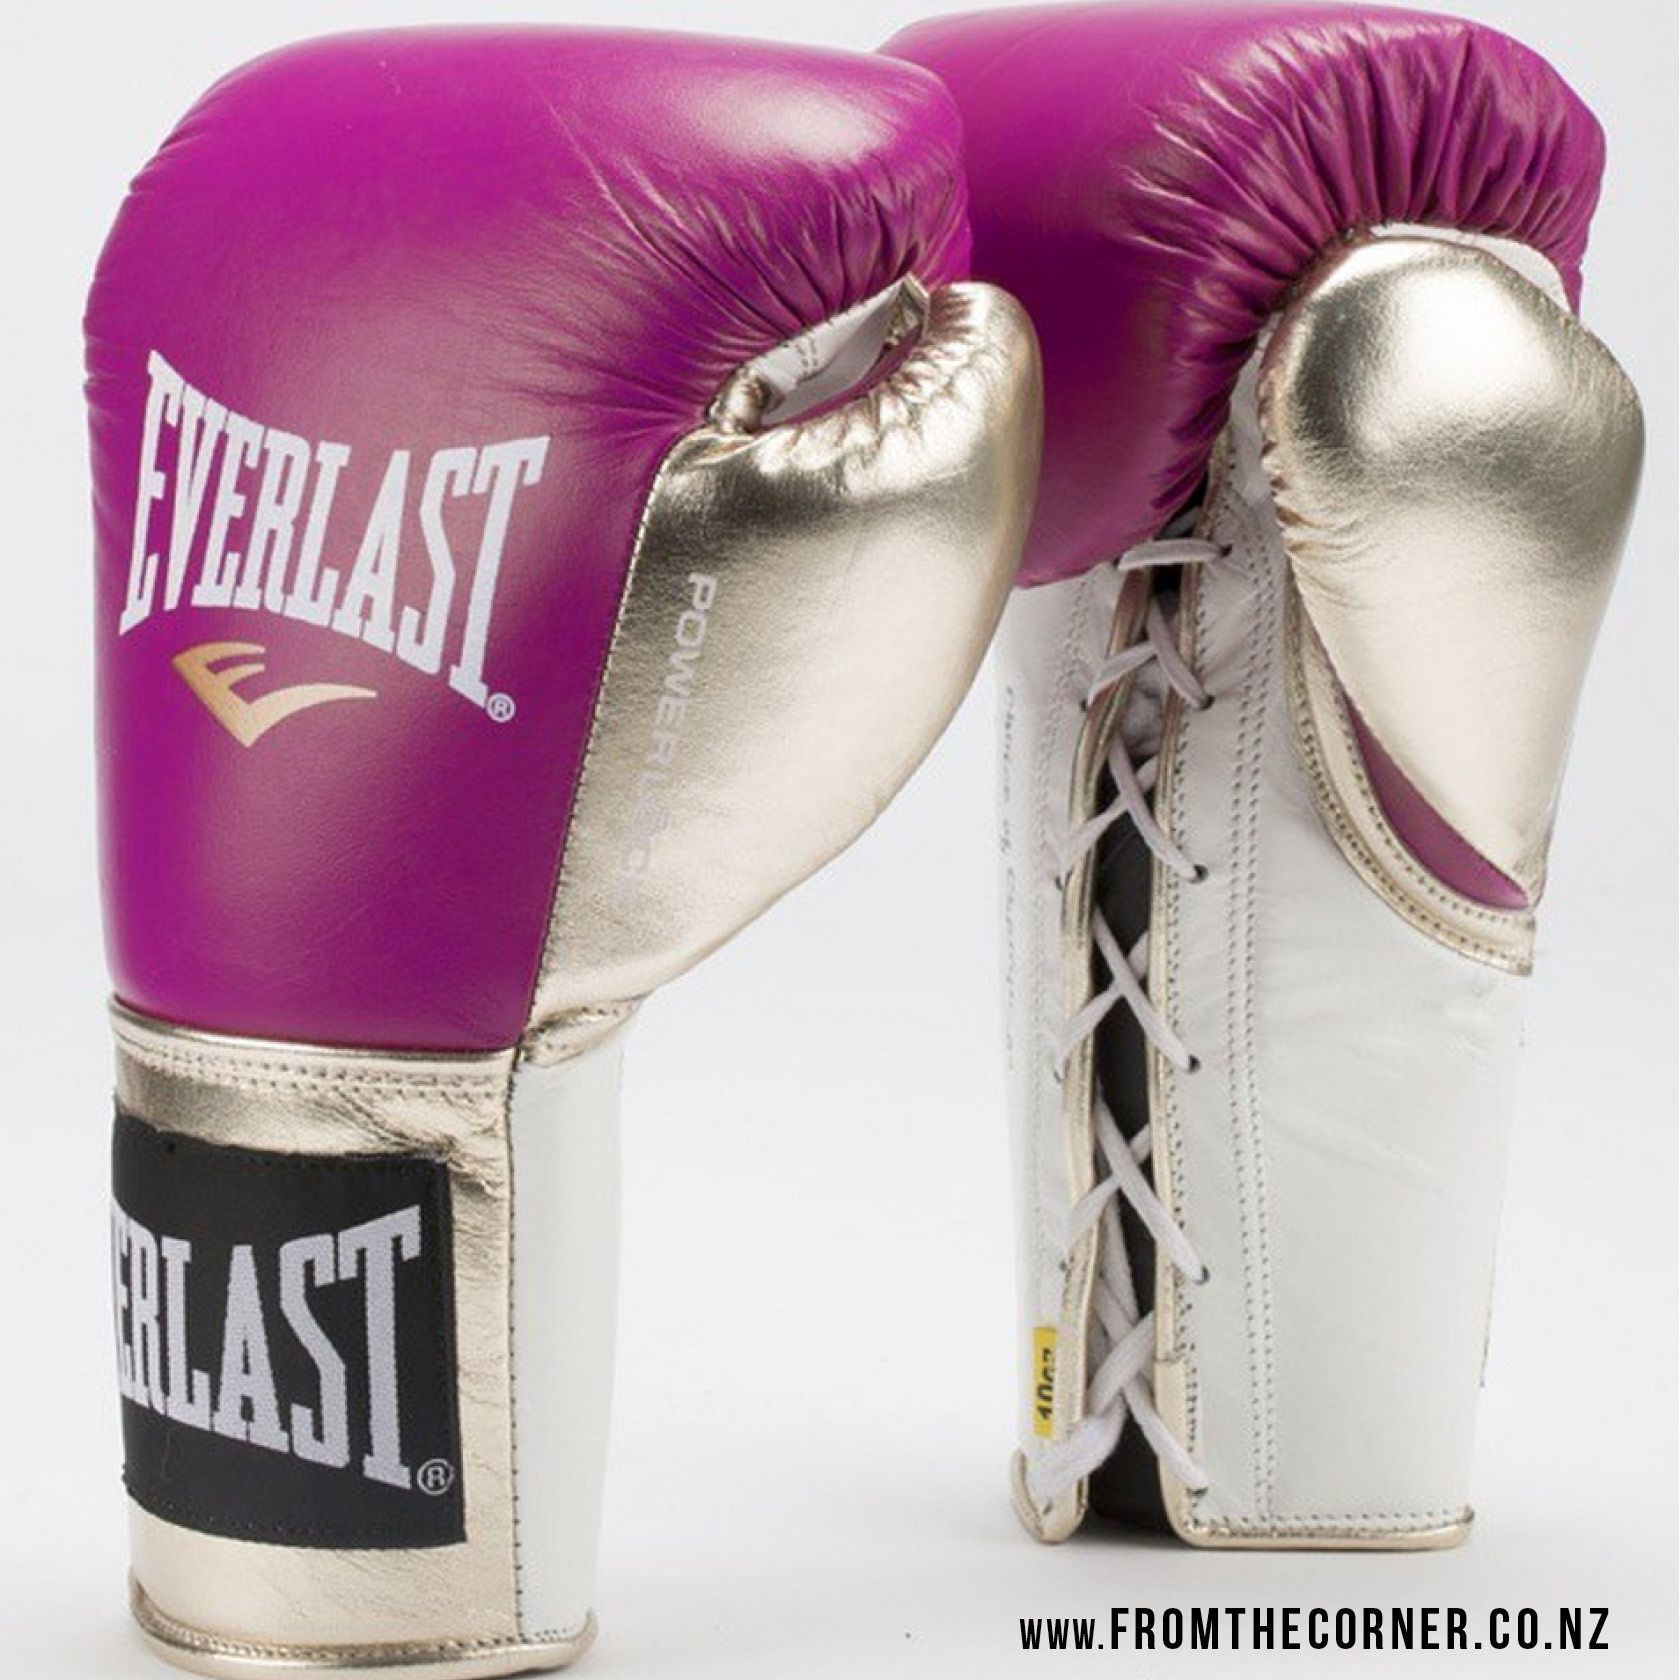 Custom Made Purple And Gold Everlast Powerlock Boxing Gloves For Chris Pearson Everlast Boxing Gloves Fight Fitness Boxing Gloves